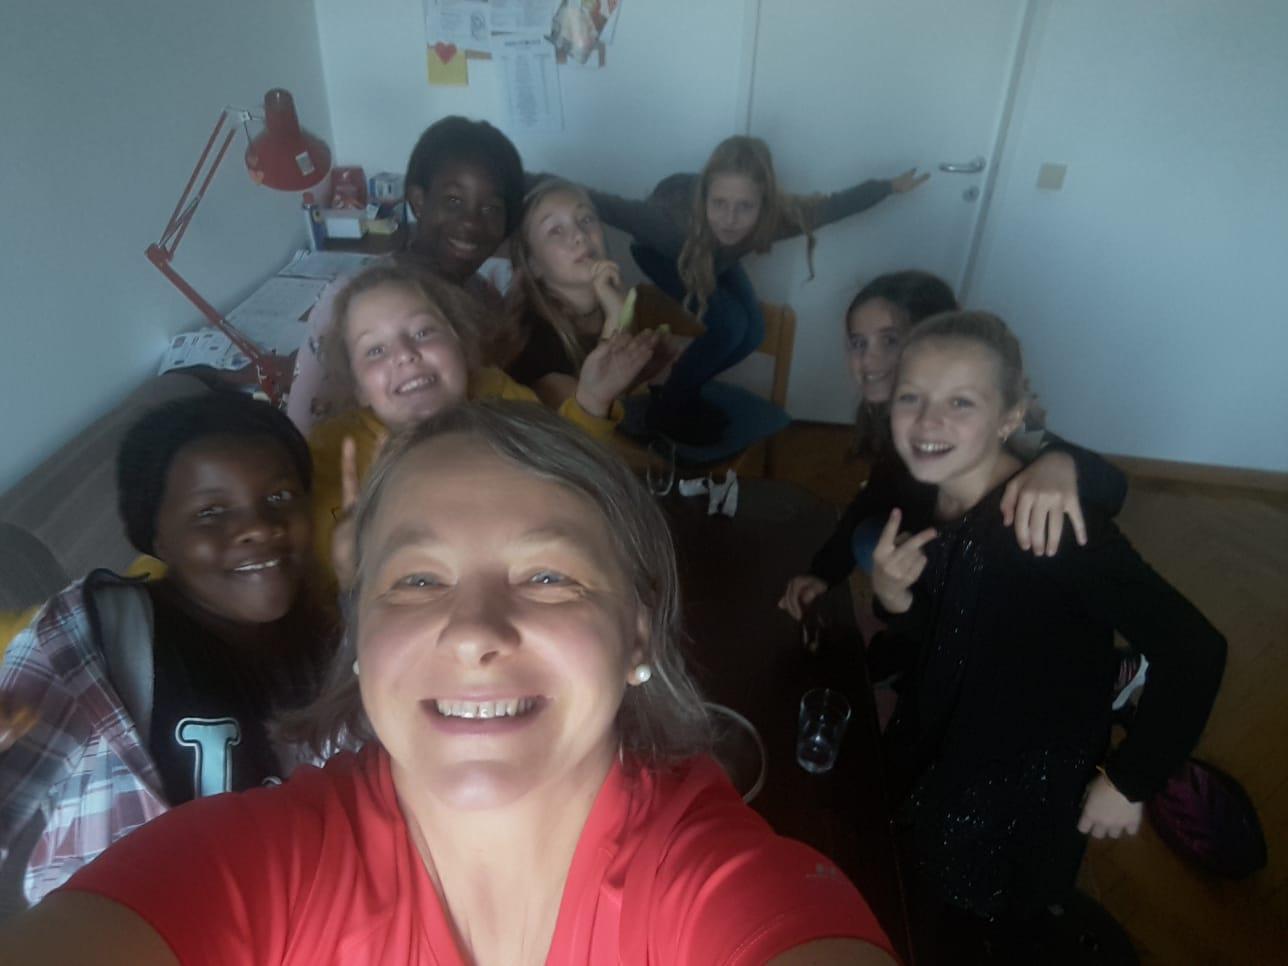 Wien Singles Gratis Kennenlernen Graz Gsting